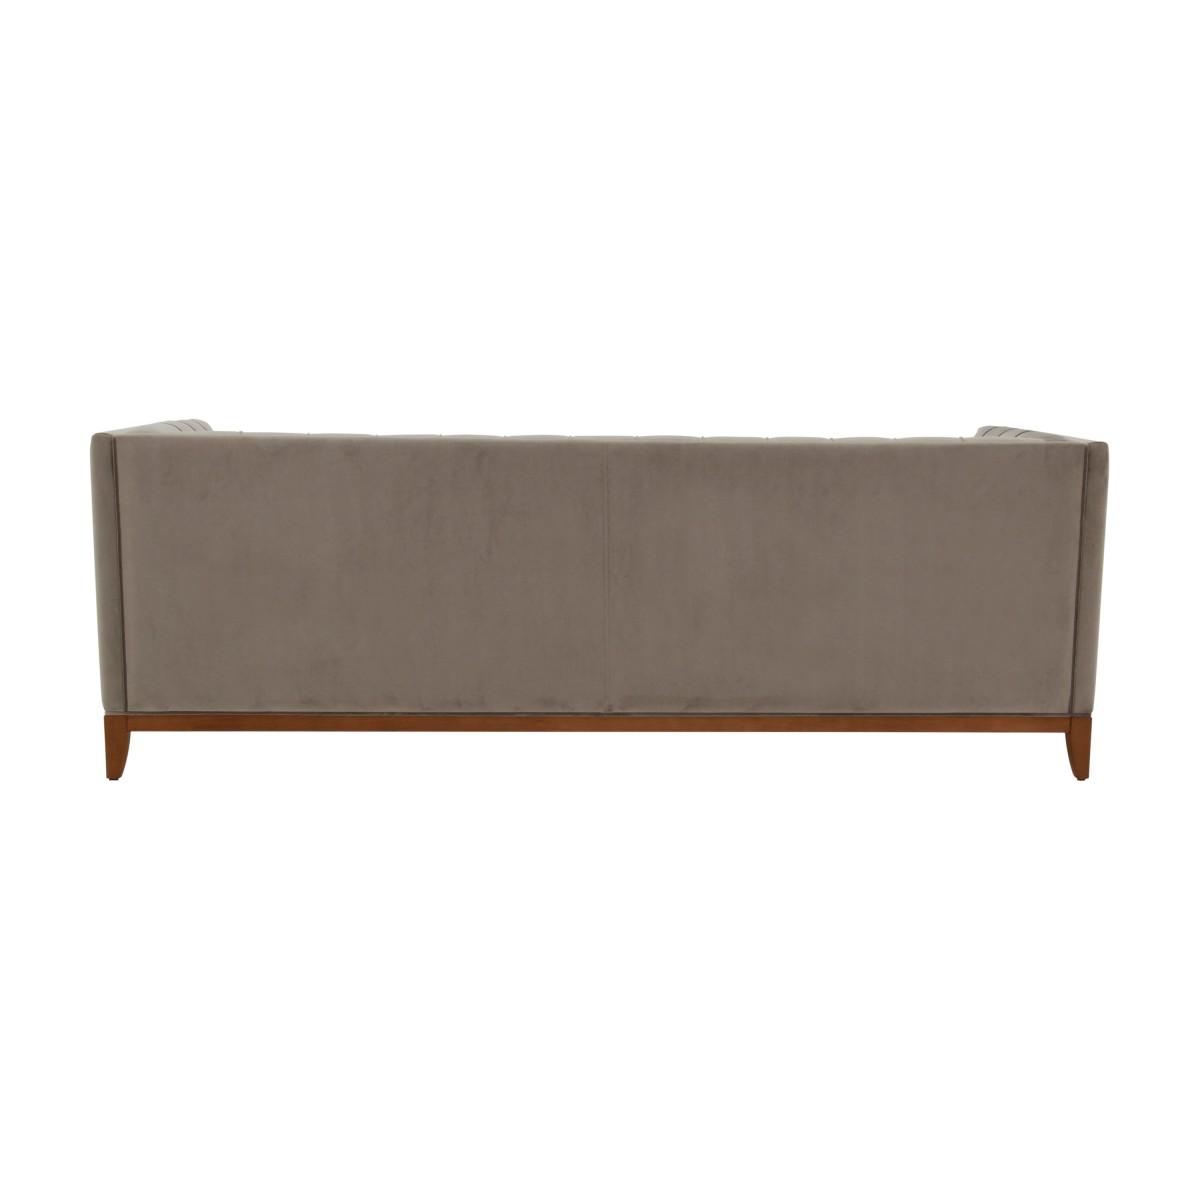 4 Seater sofa Lixis - Sevensedie